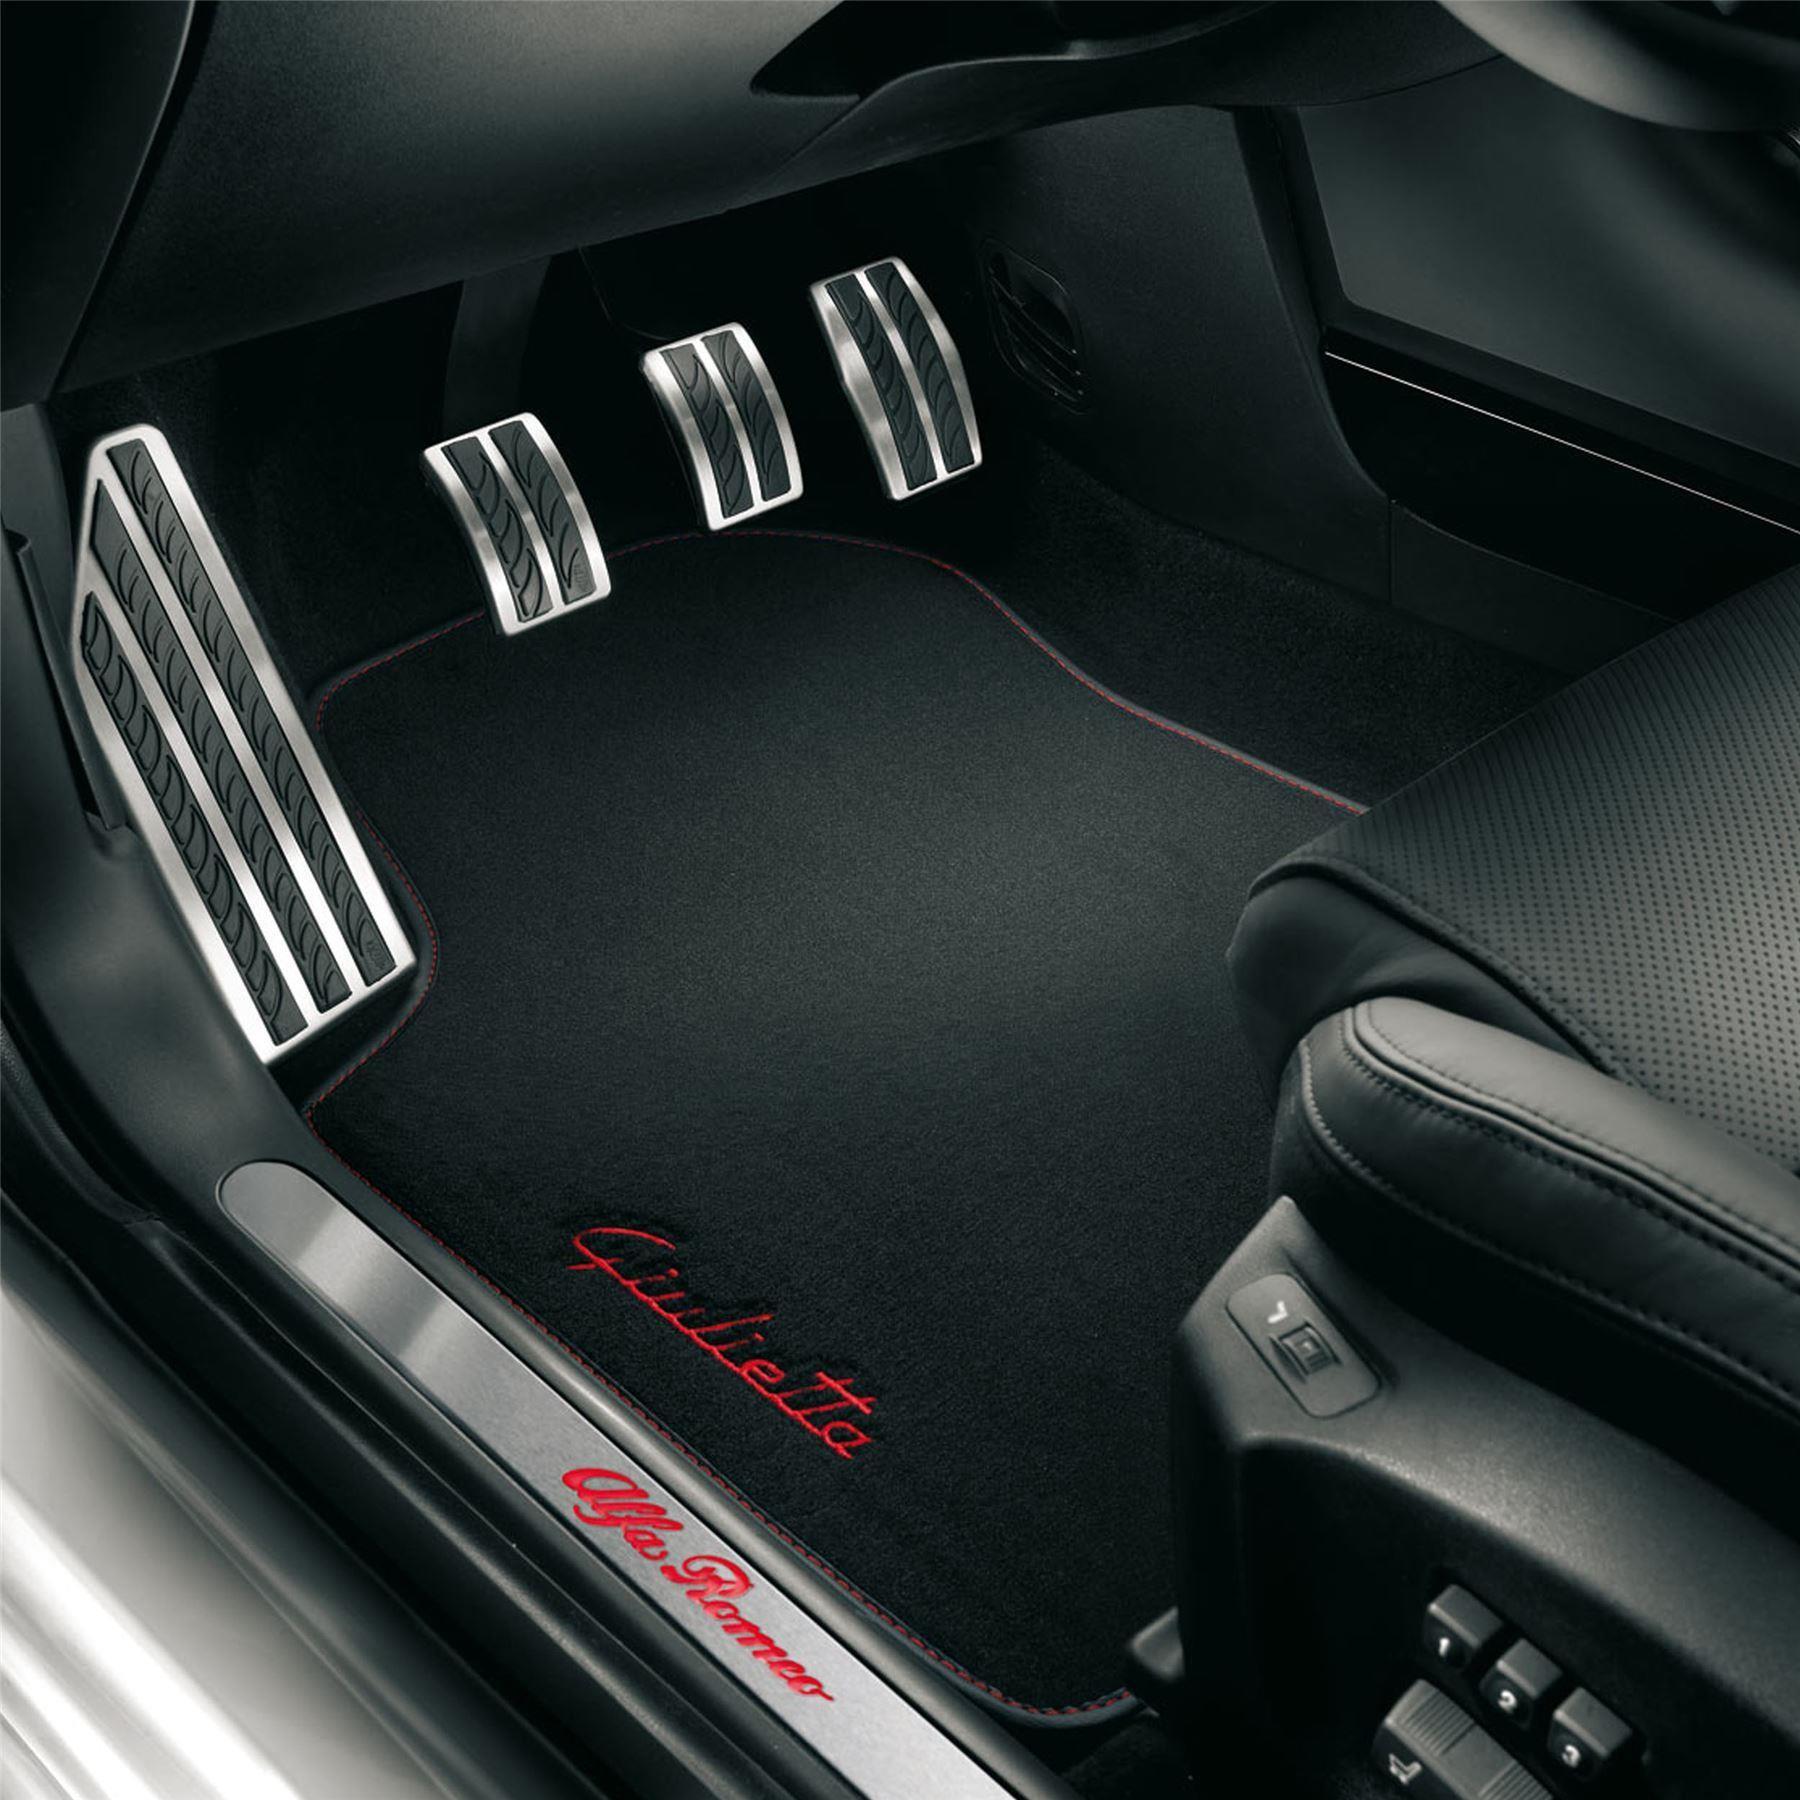 Giulietta Tailored Fitted Carpet Mats Black/Grey - 50903502